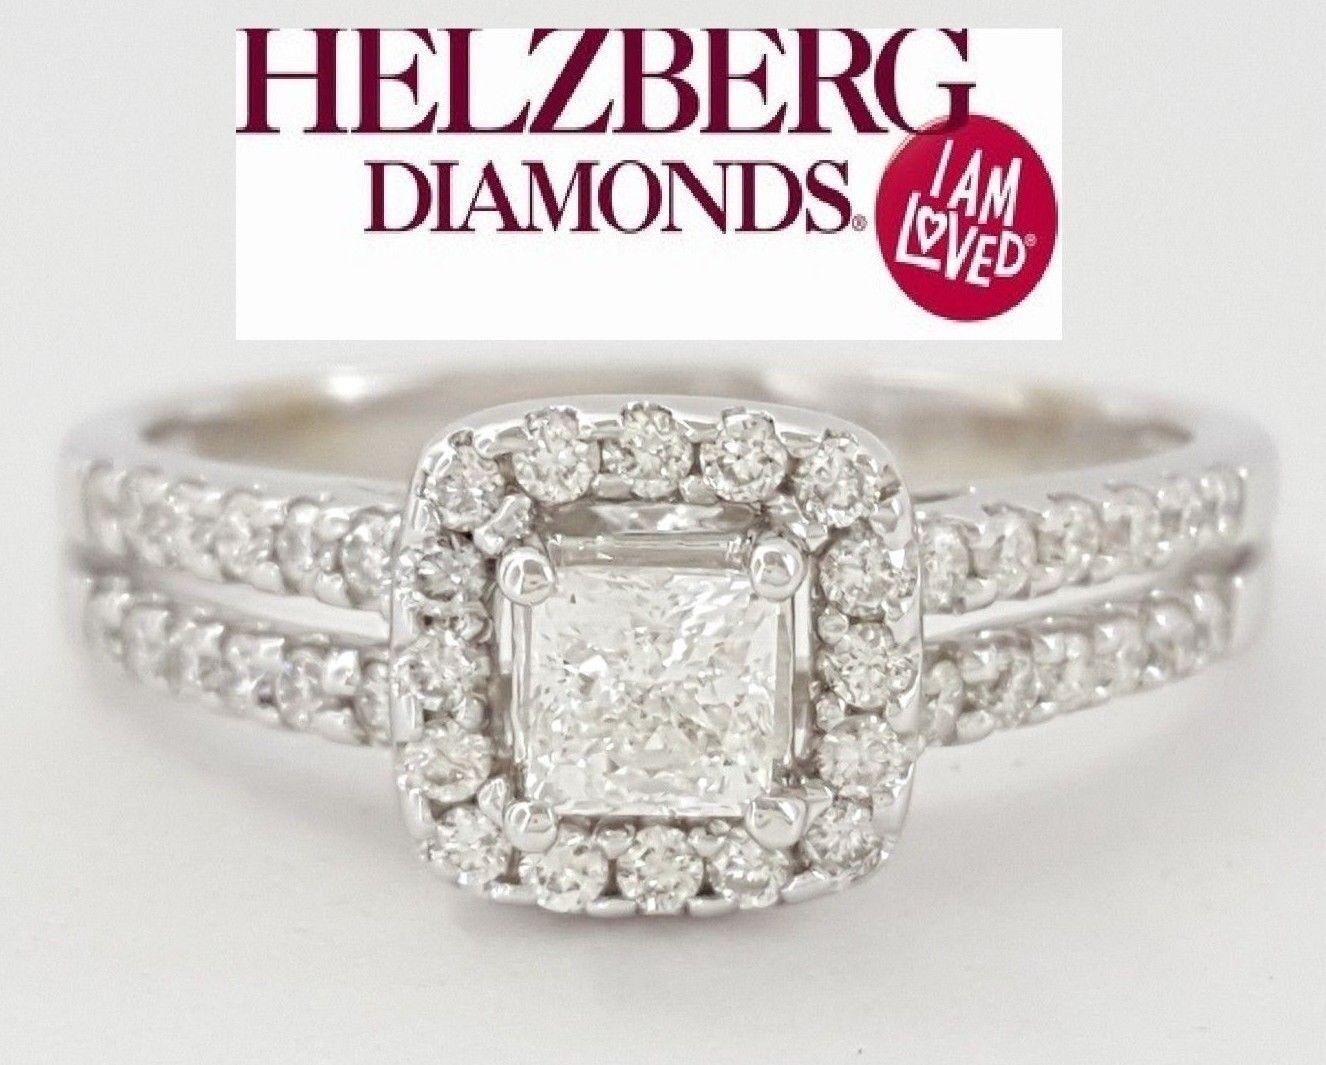 0.65 ct 14K White gold Helzberg Signature Square Diamond Halo Engagement Ring